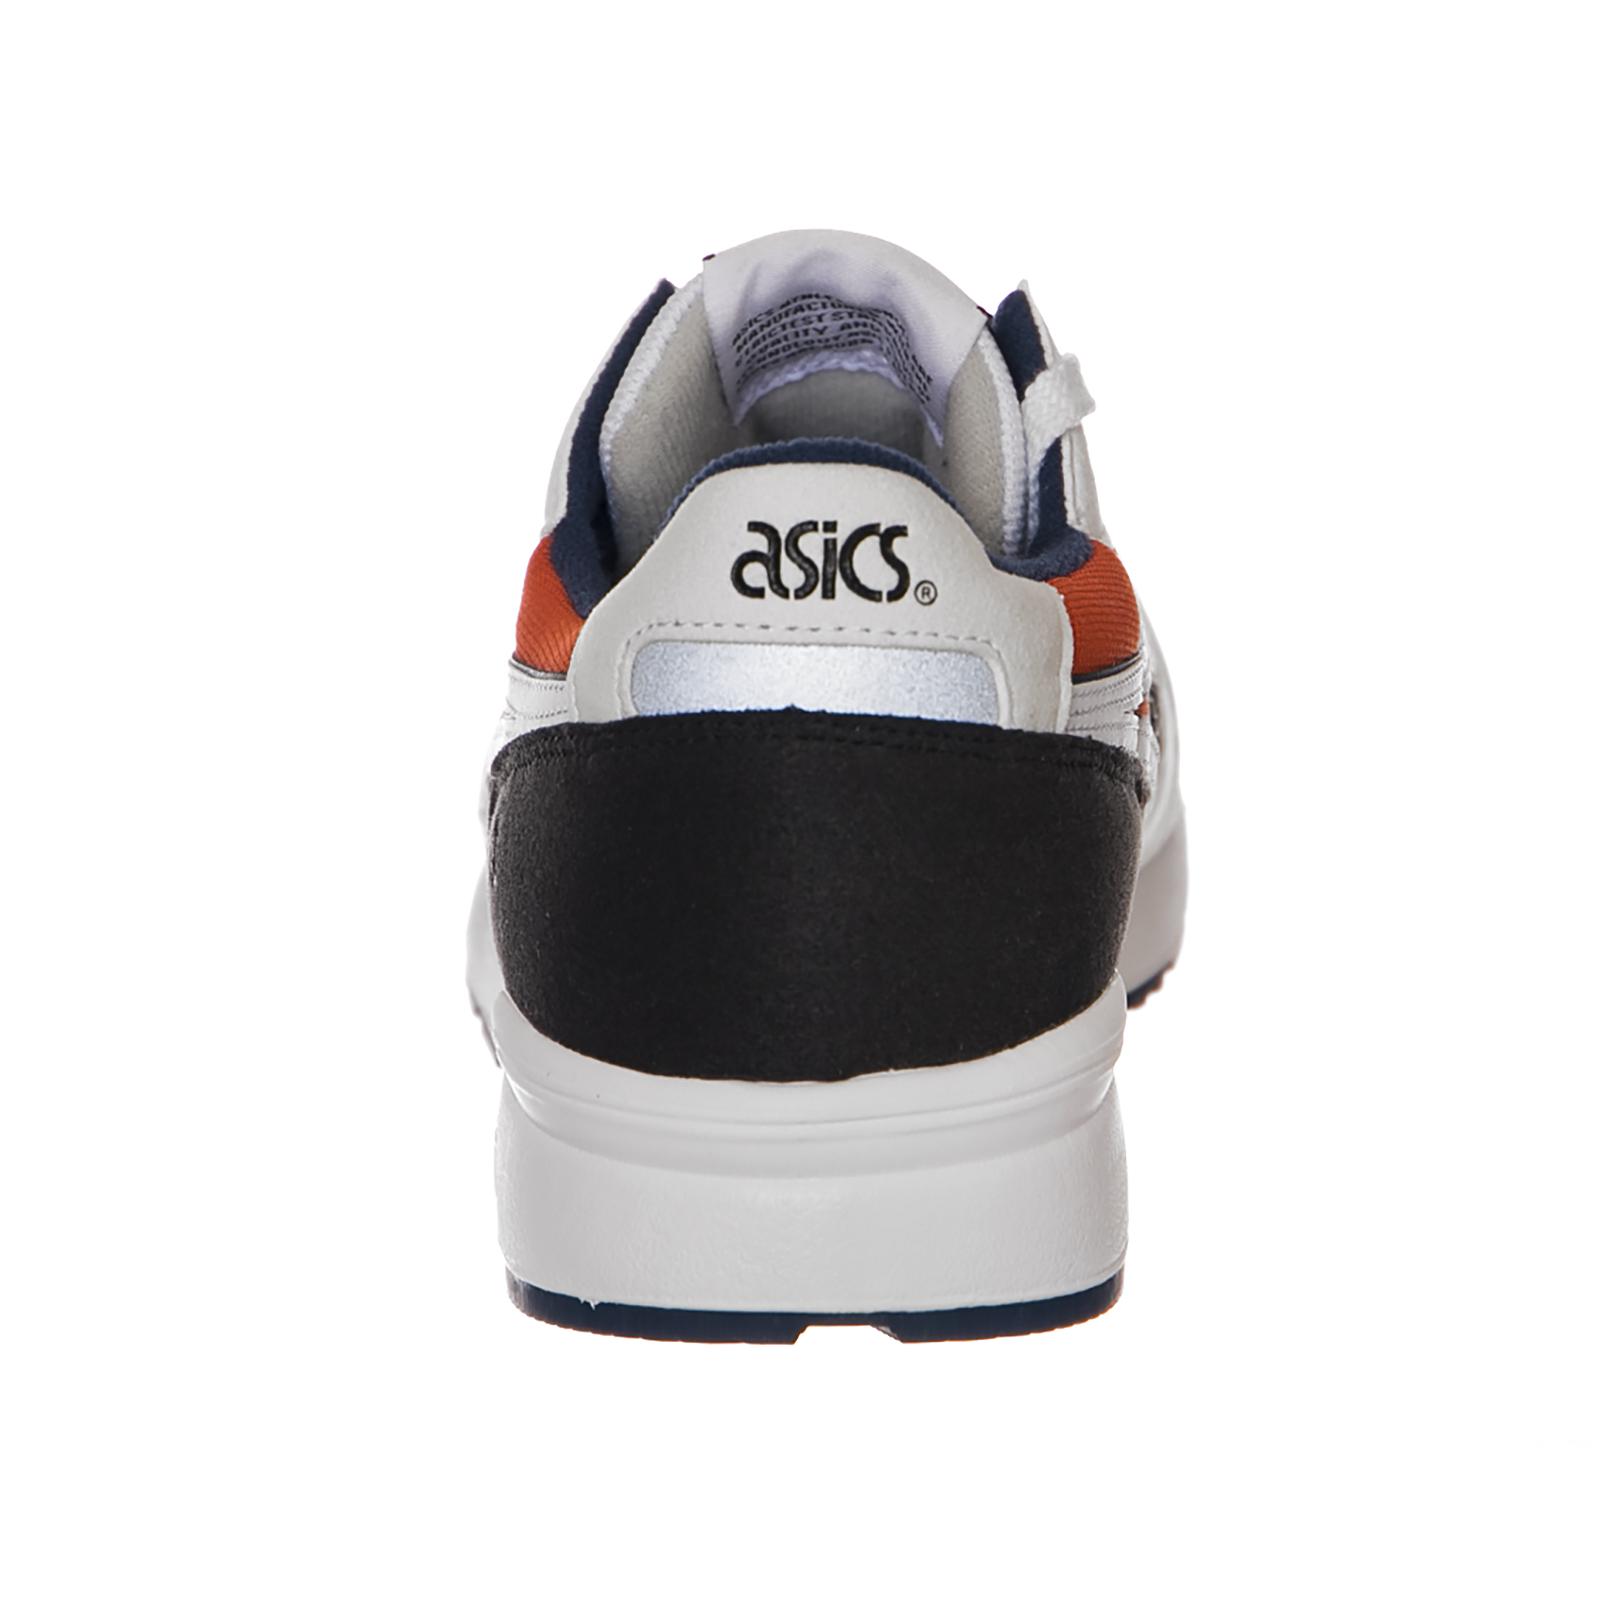 online store d05e5 287d1 ... Nike Air Max Plus TN Tuned Tuned Tuned 1 NS GPX Big Logo Total Orange  Black ...